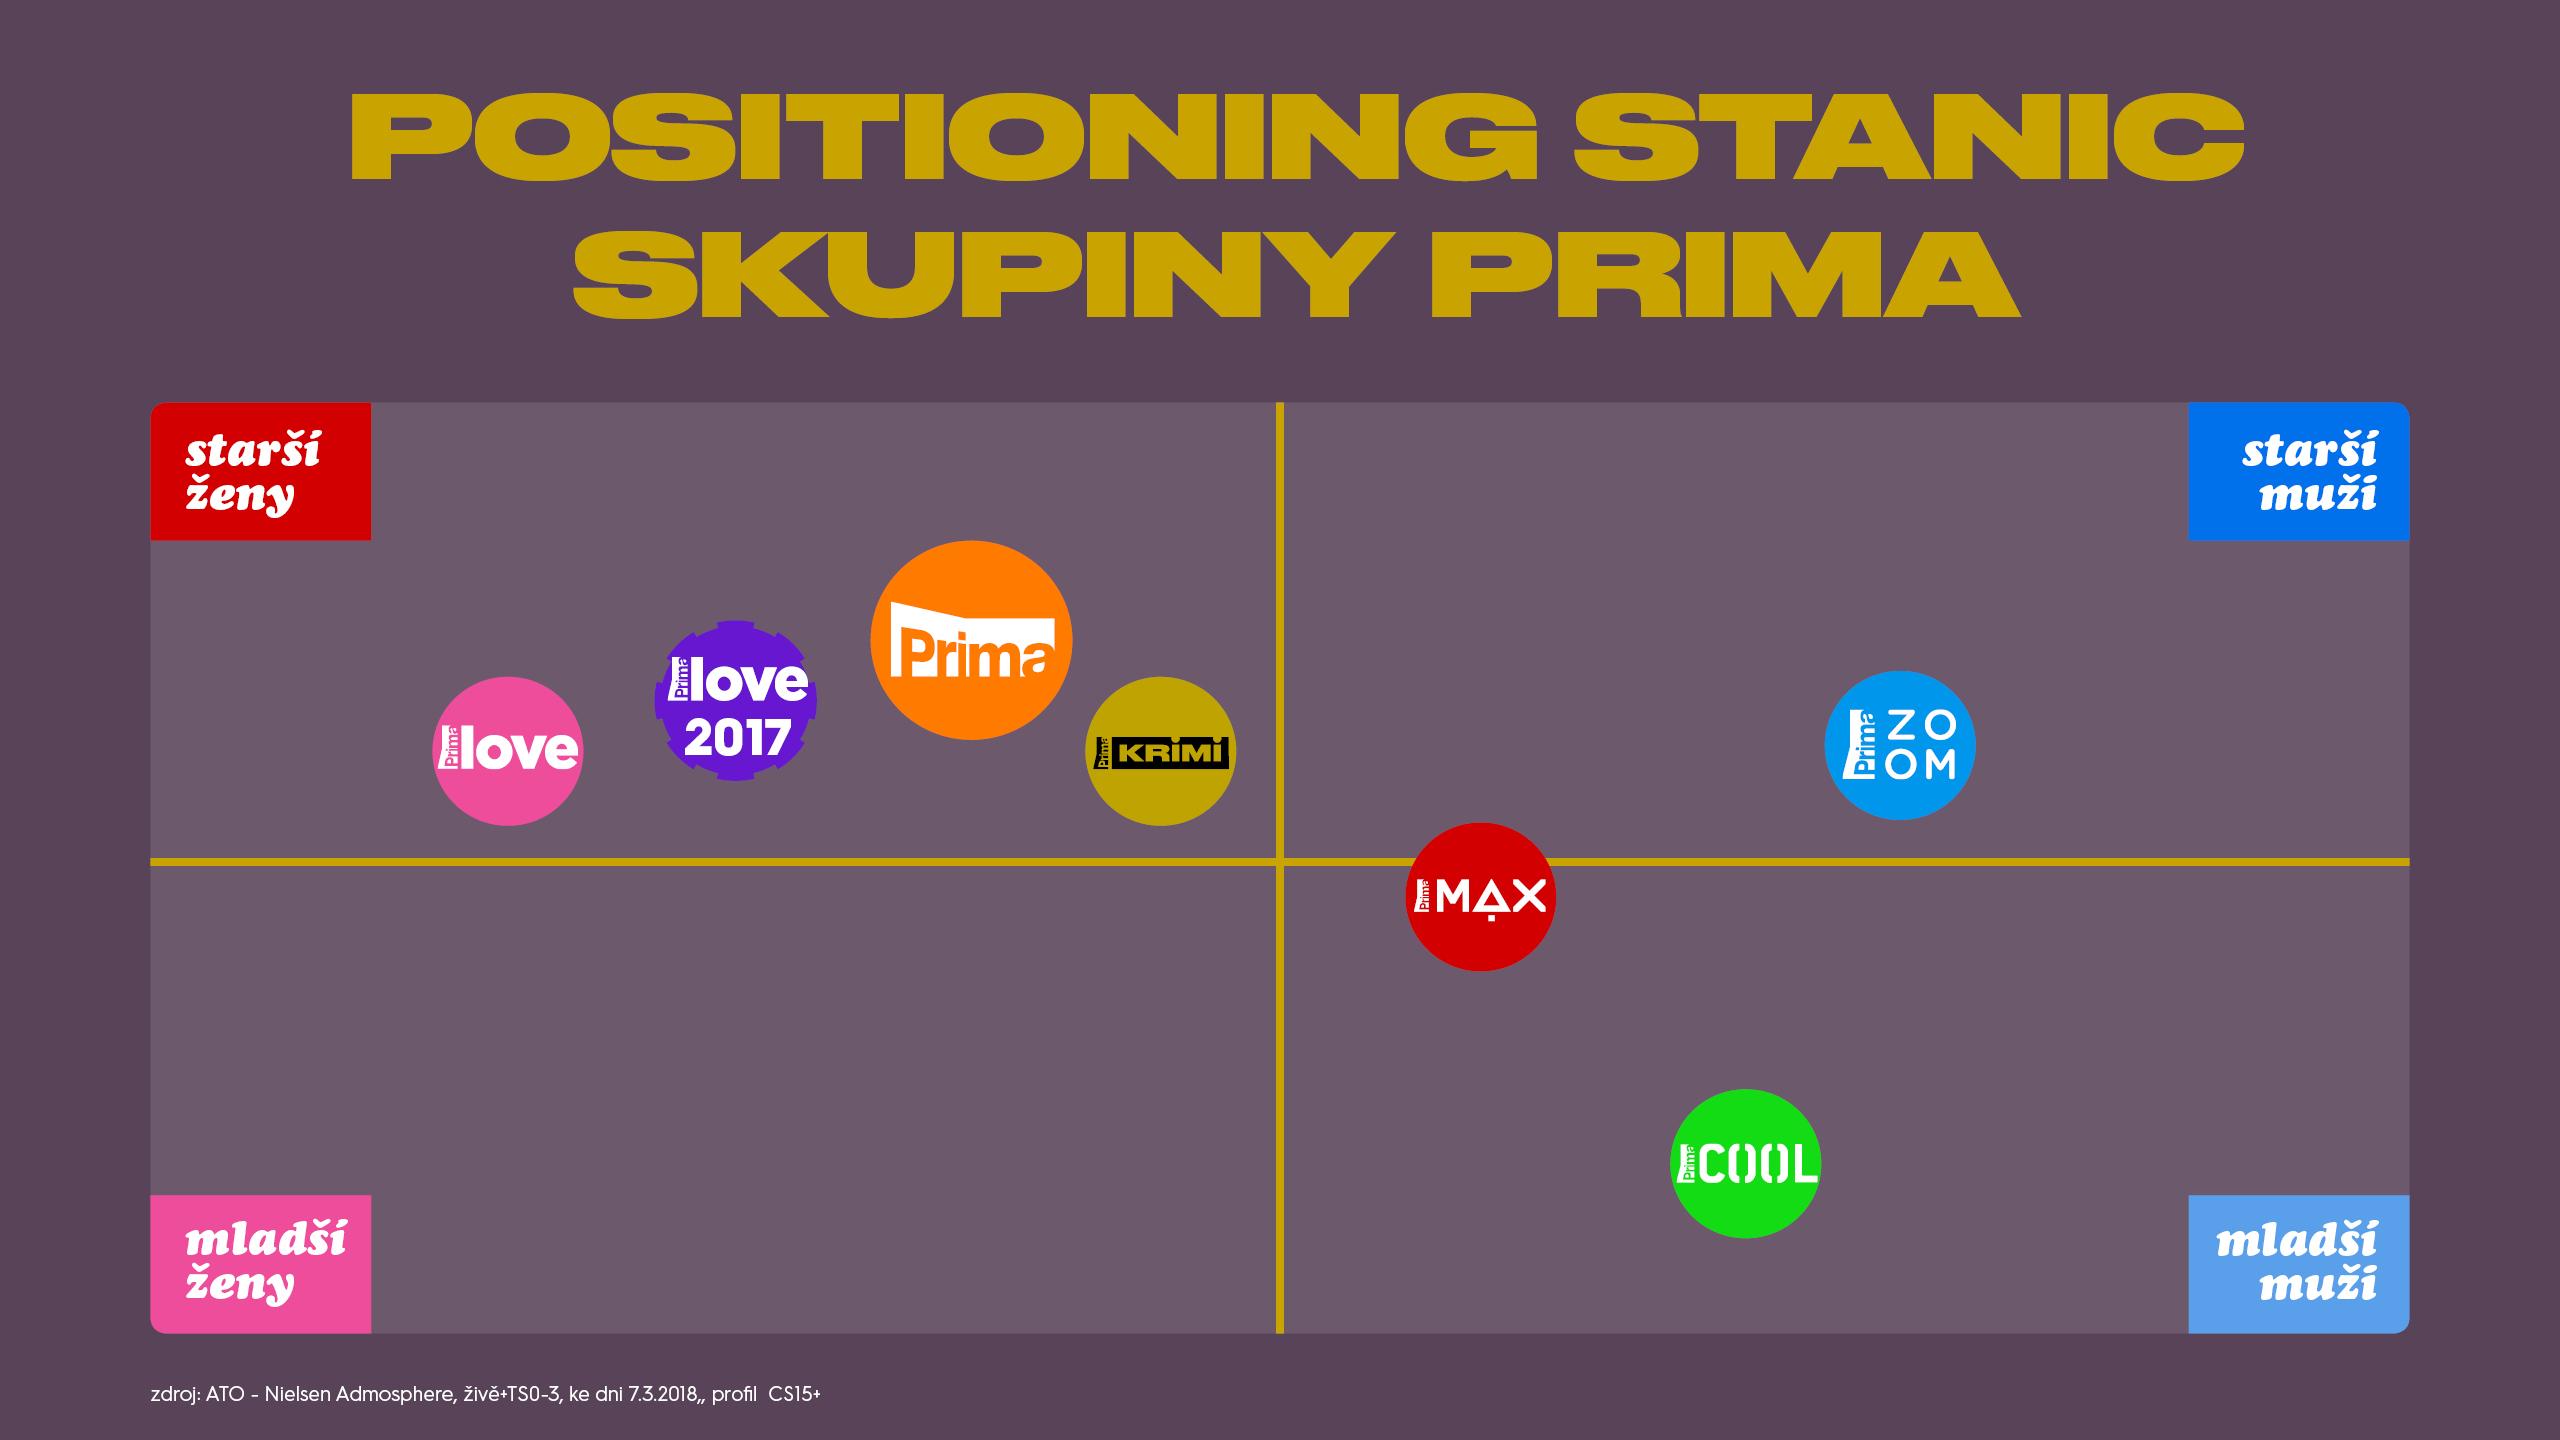 Positioning stanic skupiny Prima